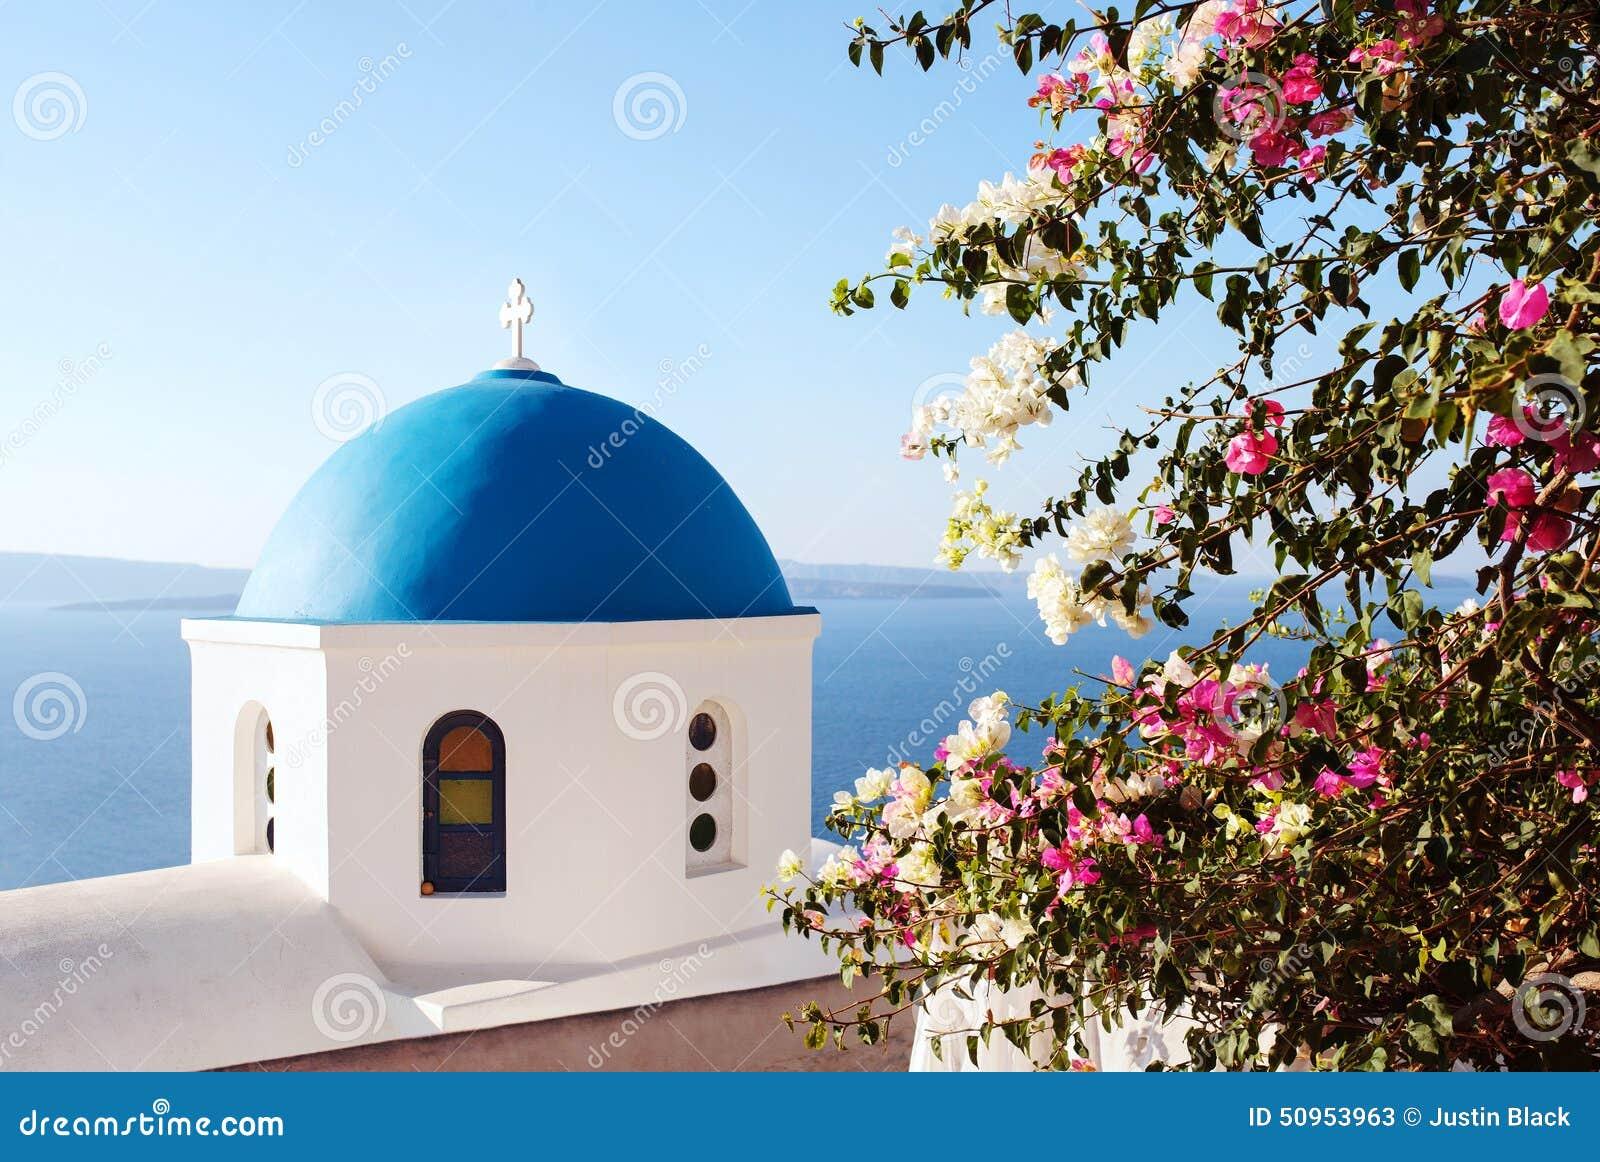 Santorini classic blue dome church. Greece.